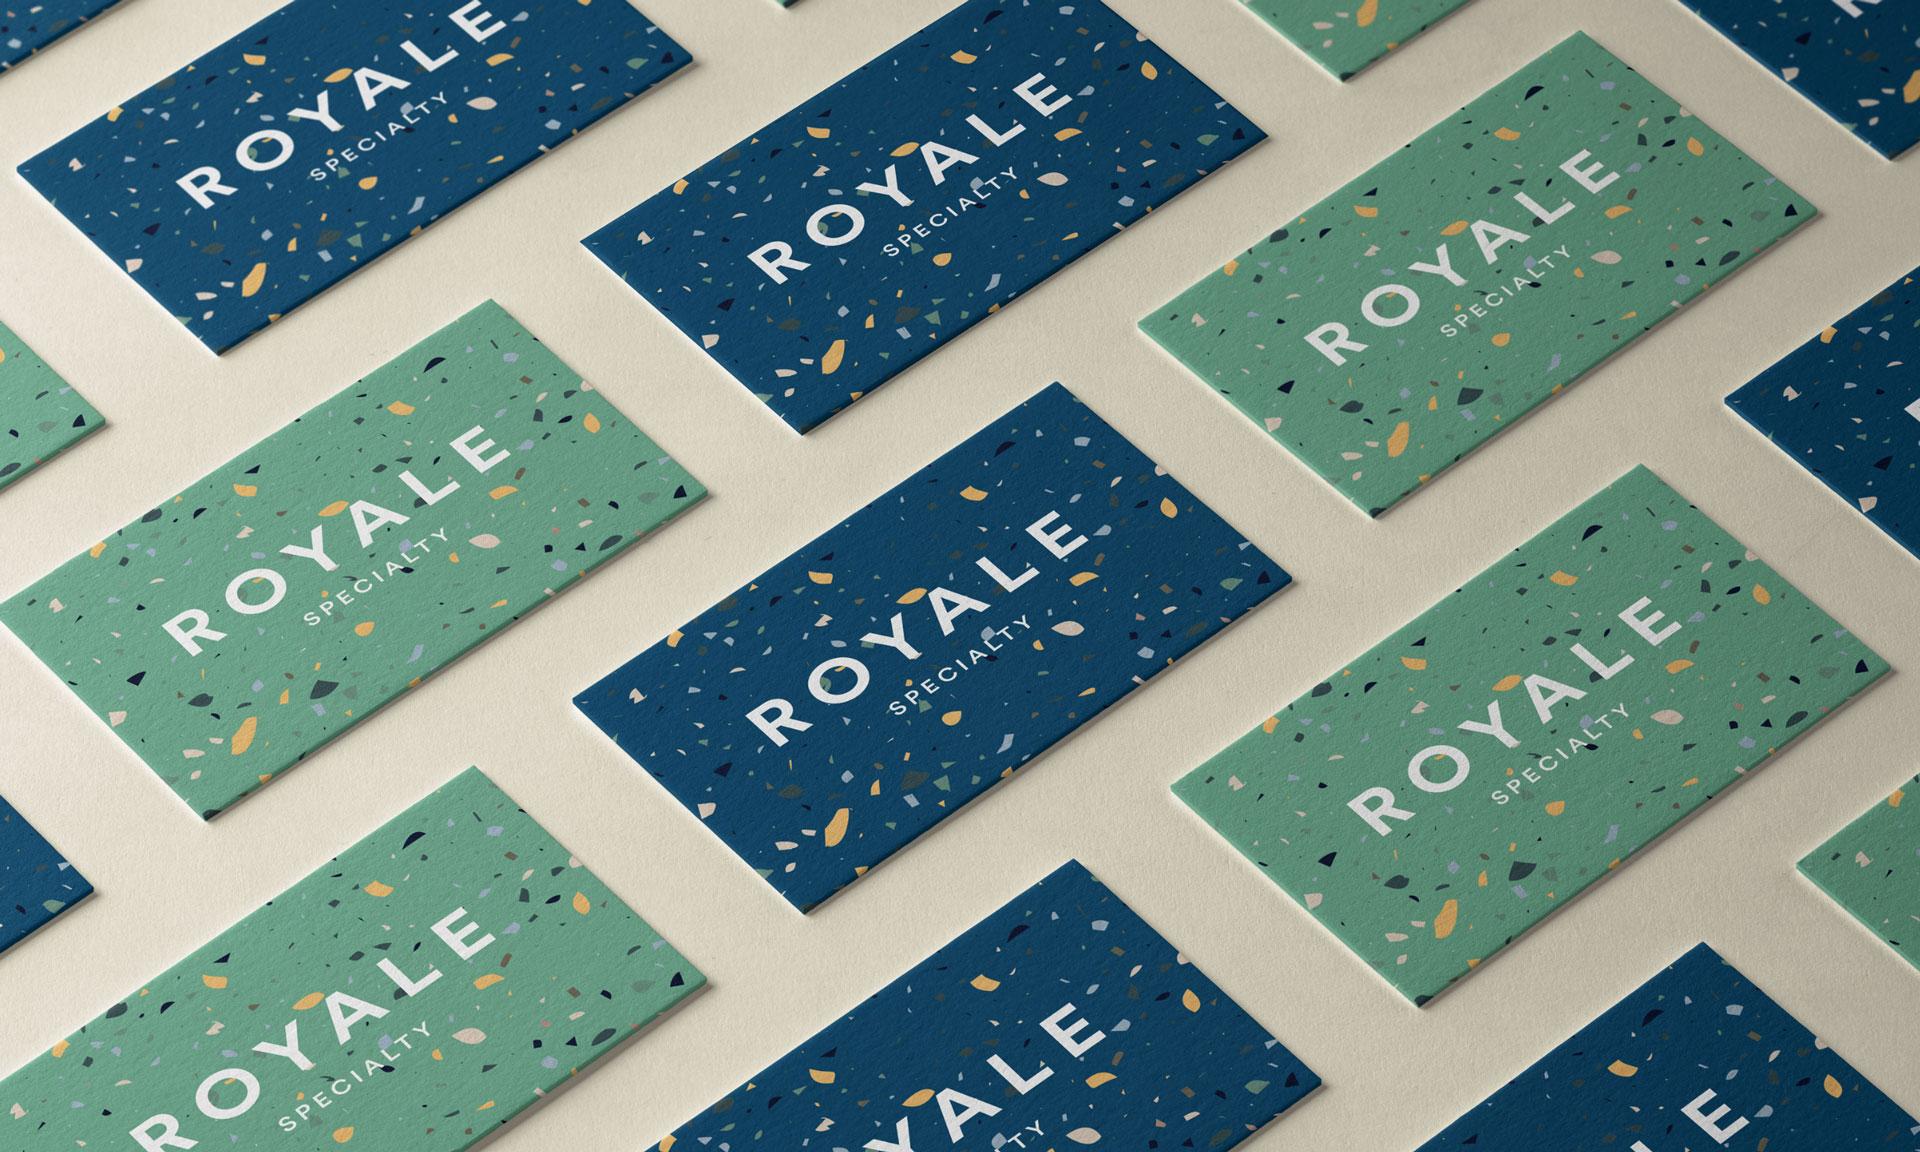 Nectar-&-Co-Royale Specialty Cafe Brand Design.jpg